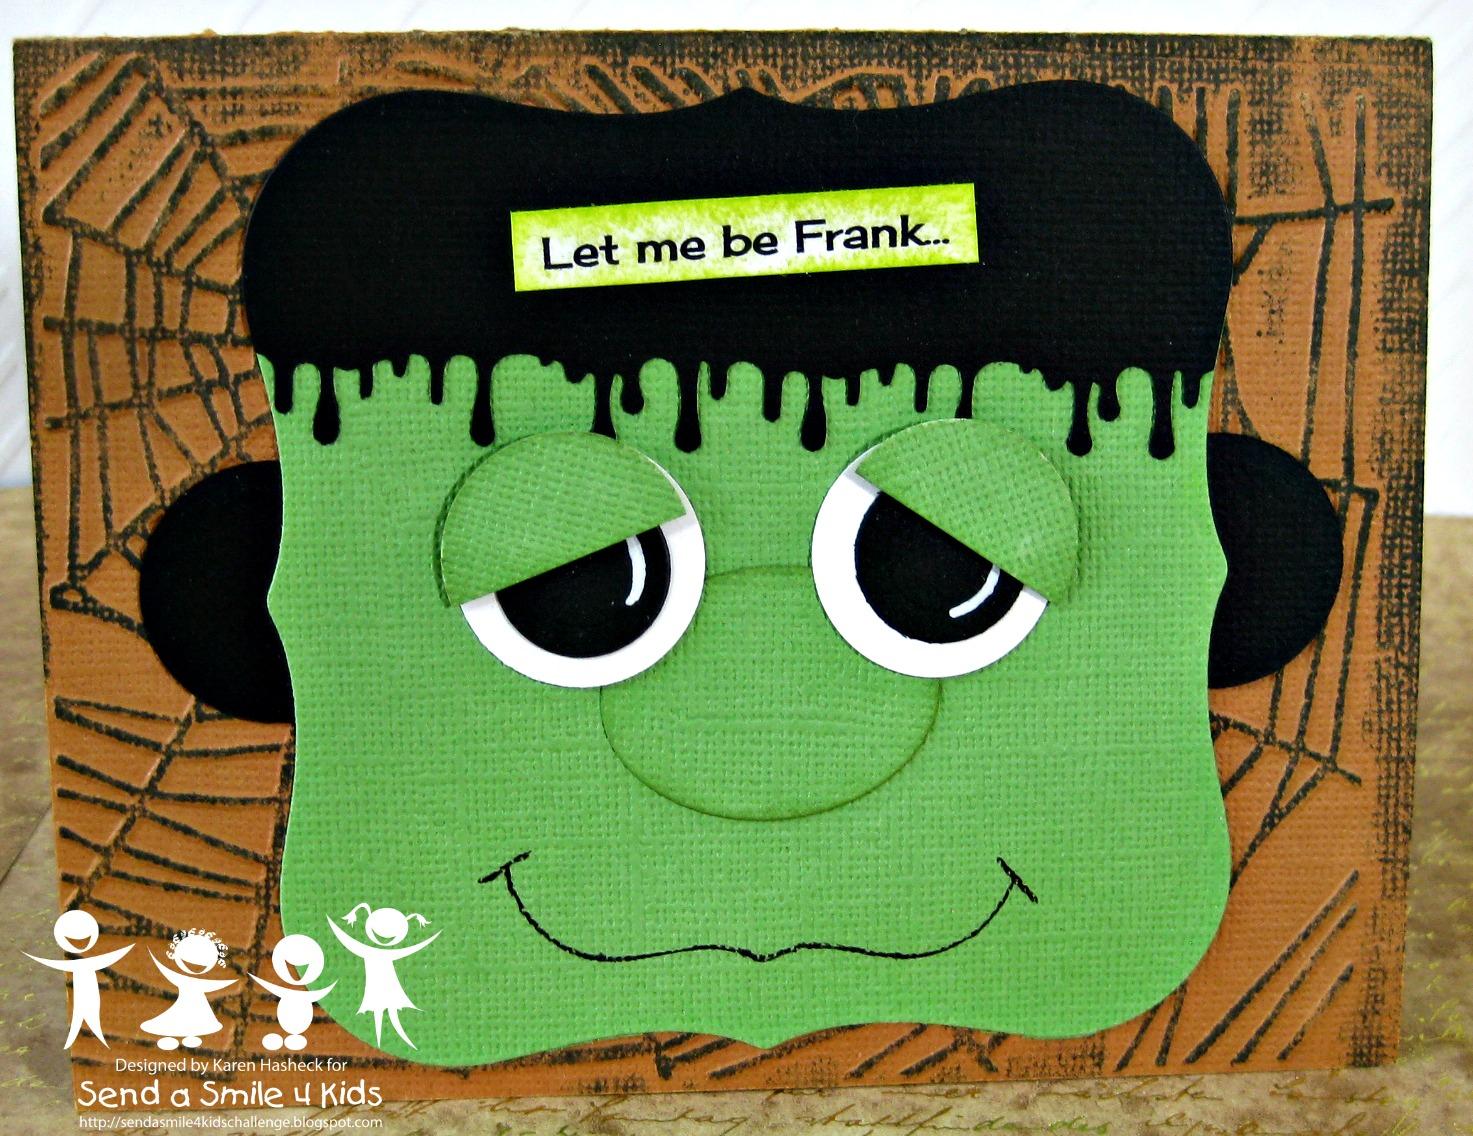 Karen S Kreative Kards Humorous Or Slimy Cards 4 Kids Or Anything